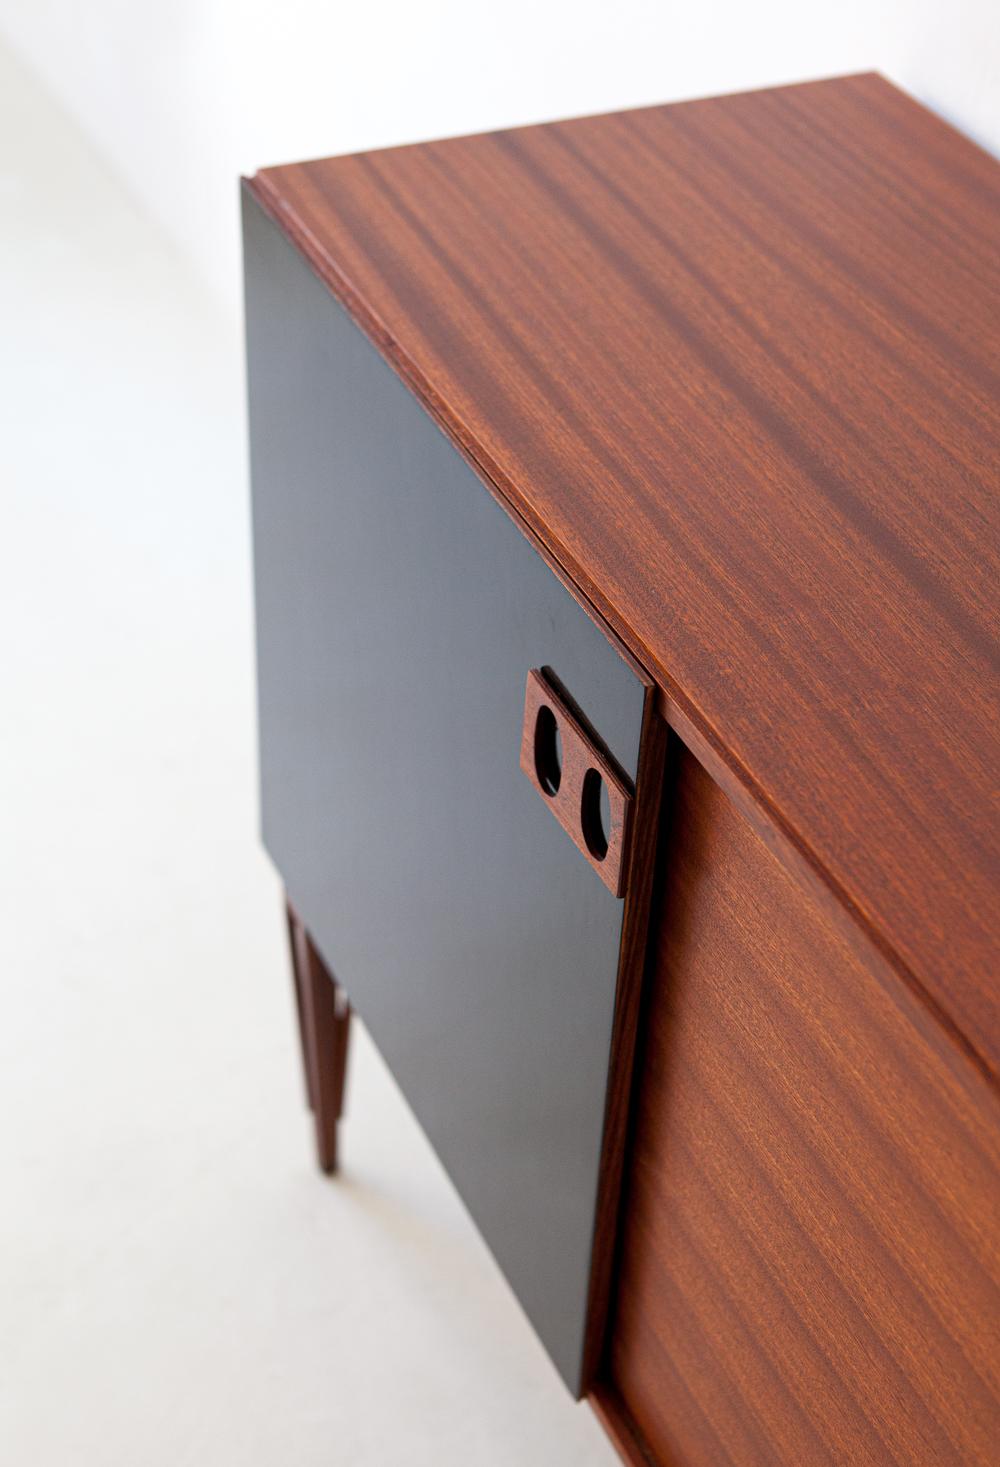 1950s-italian-mahogany-sideboard-by-fratelli-proserpio-4-st120